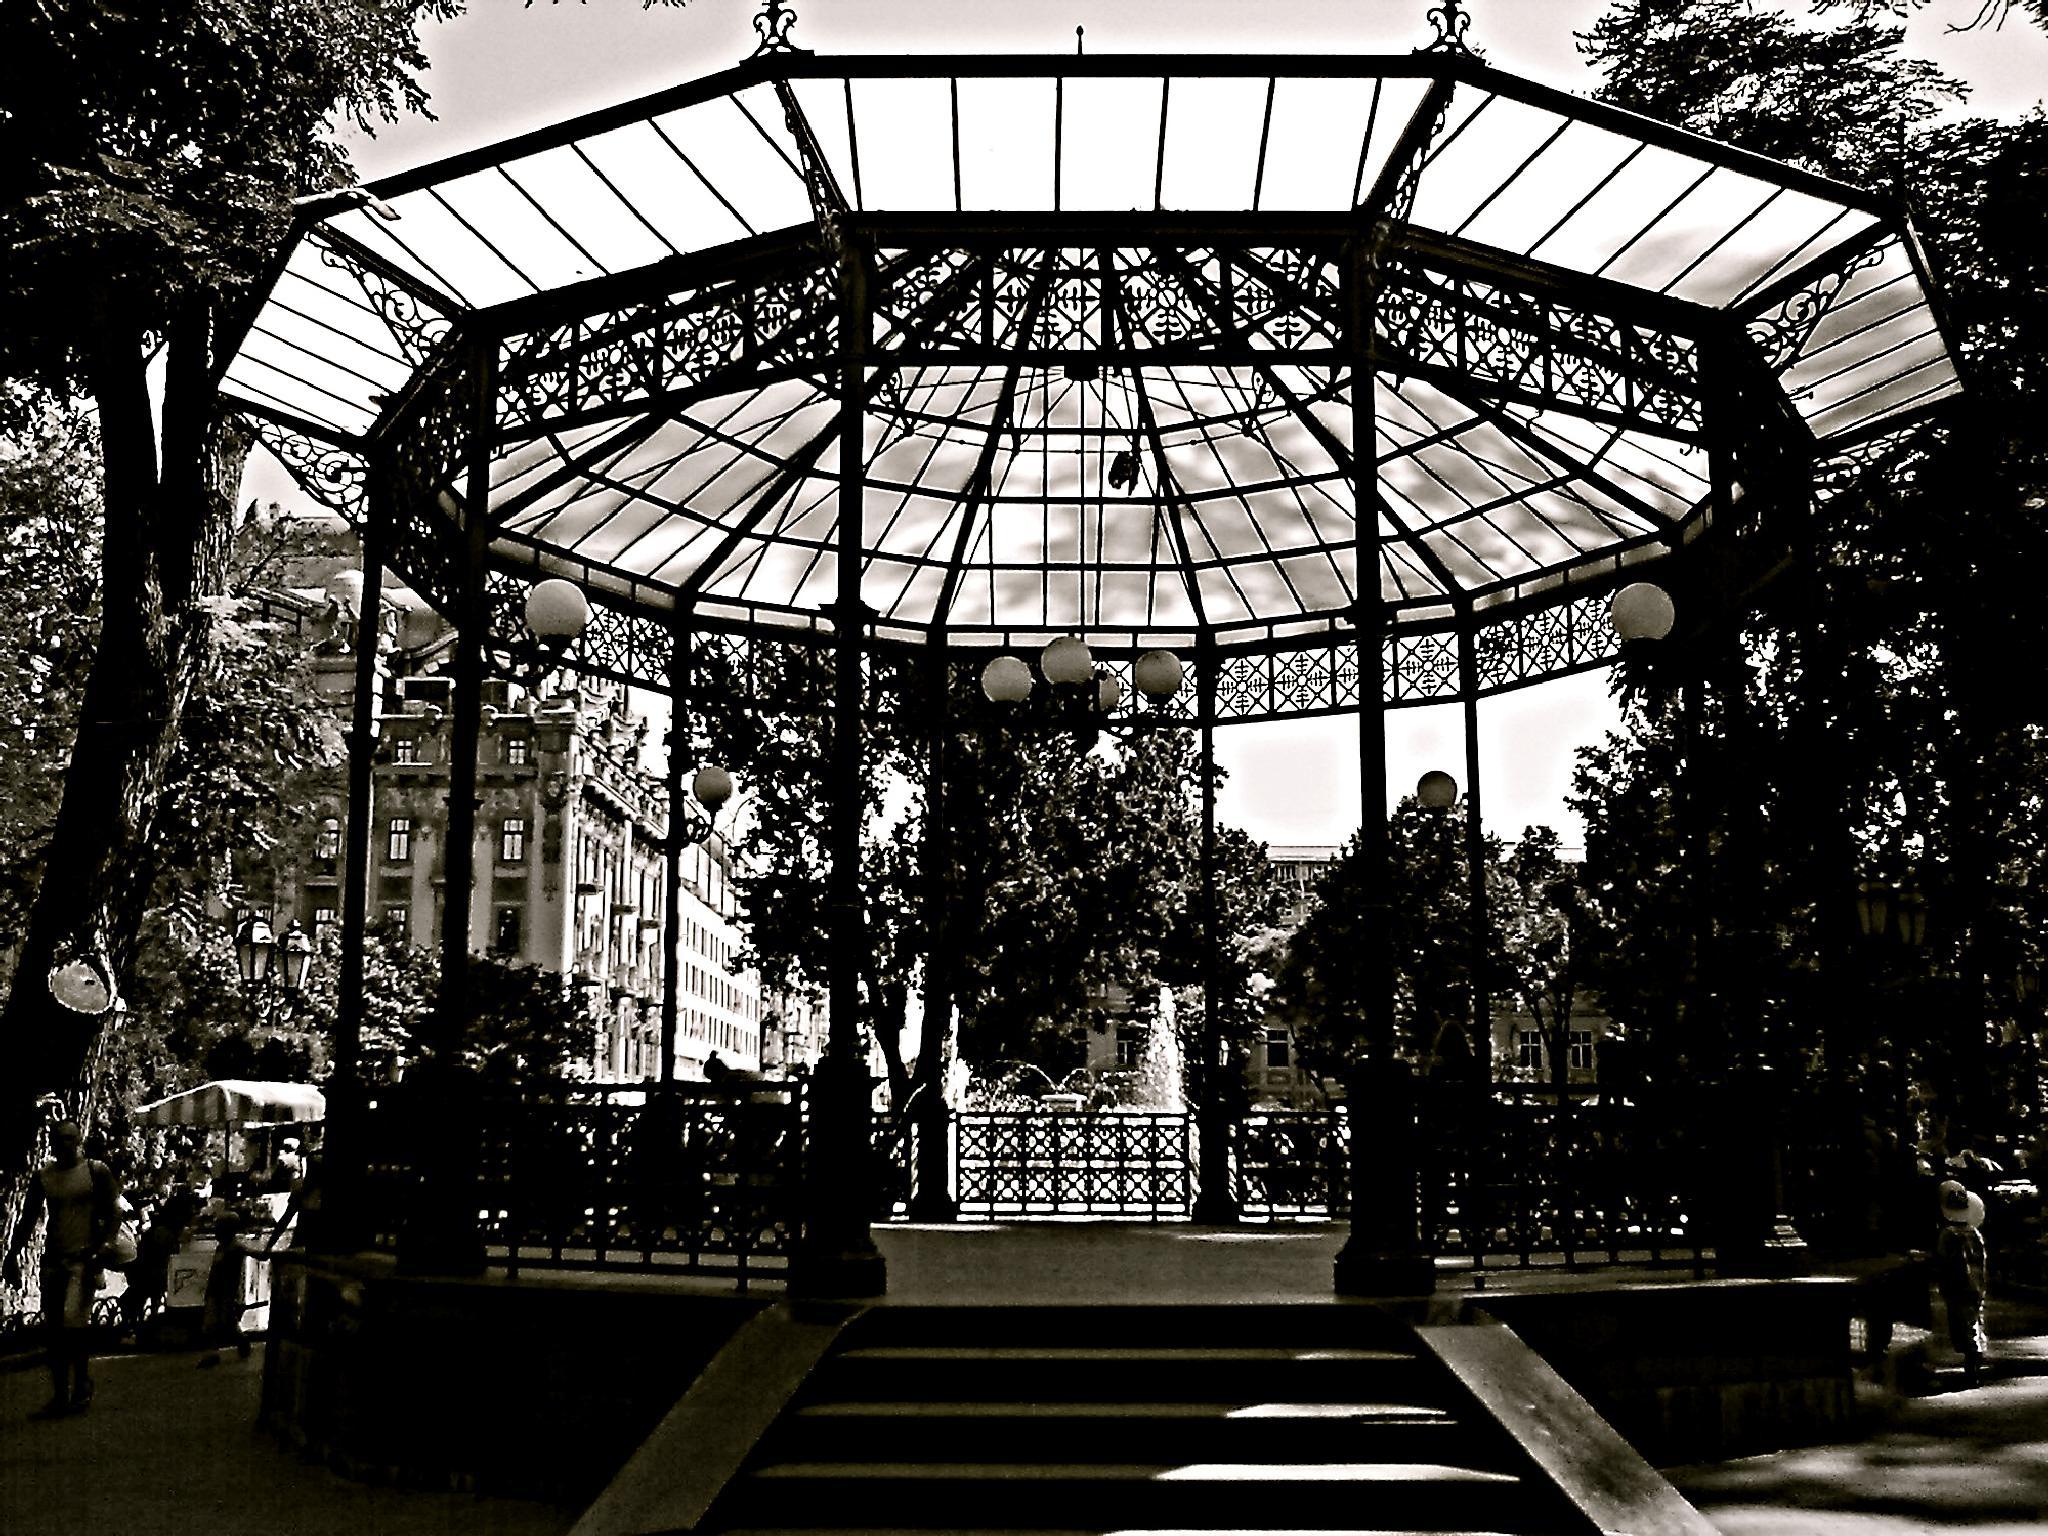 City Garden Odessa by Dmitriy Sokolov